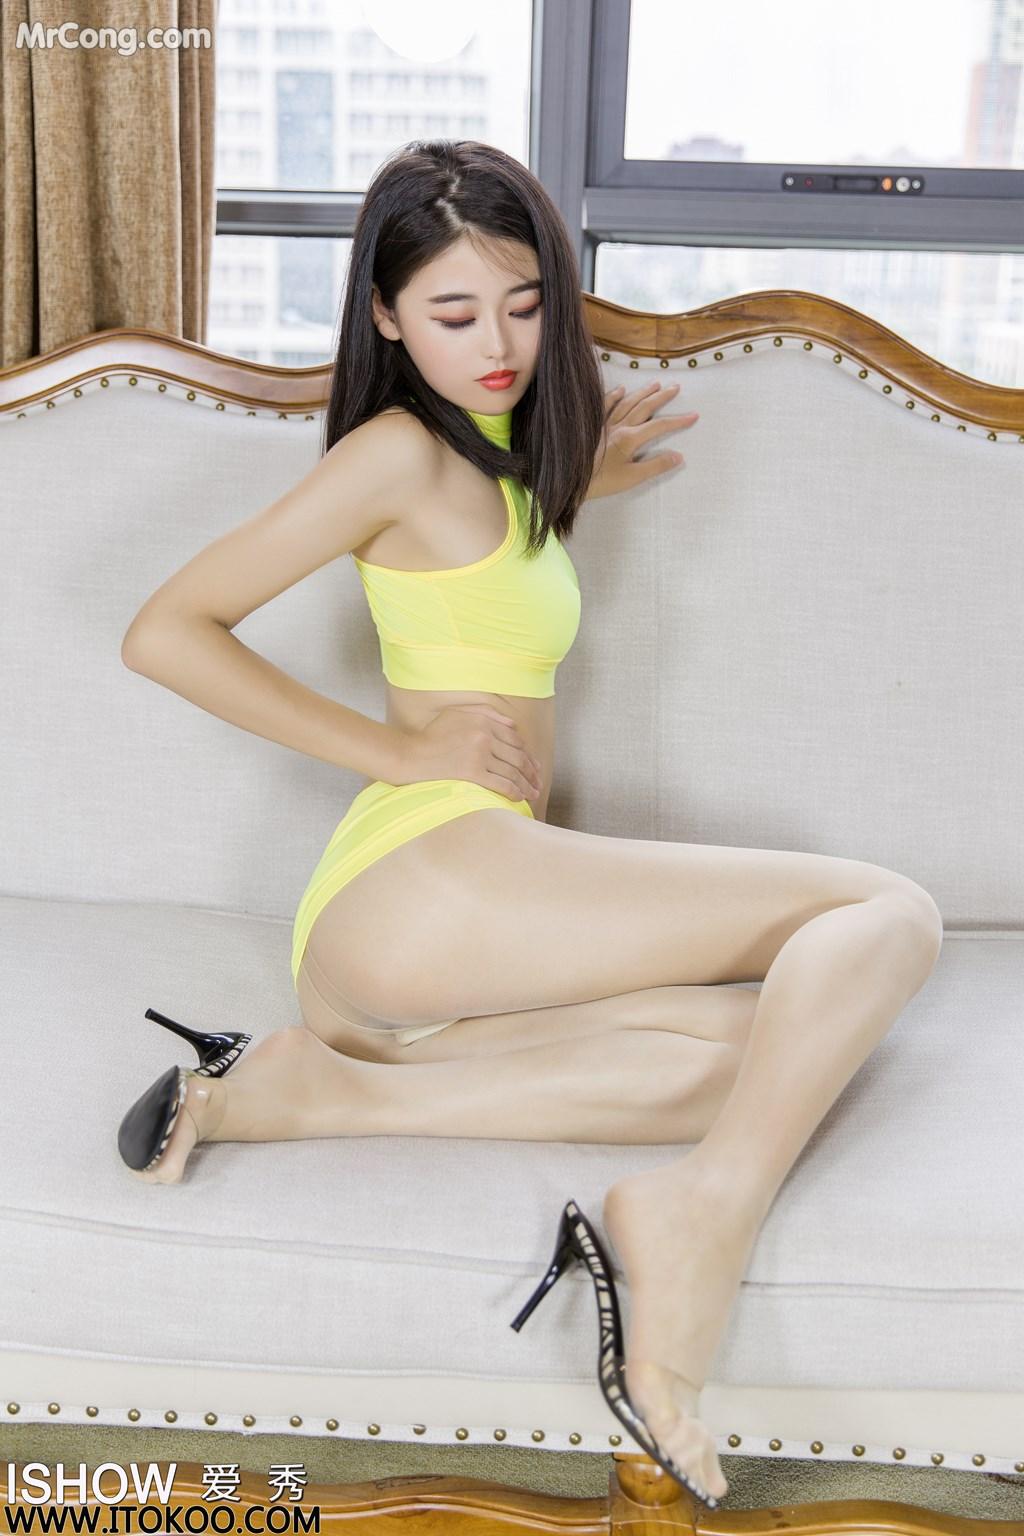 Image ISHOW-No.176-Liu-Yue-Fei-Phoebe-MrCong.com-009 in post ISHOW No.176: Người mẫu Liu Yue Fei (刘玥菲Phoebe) (31 ảnh)